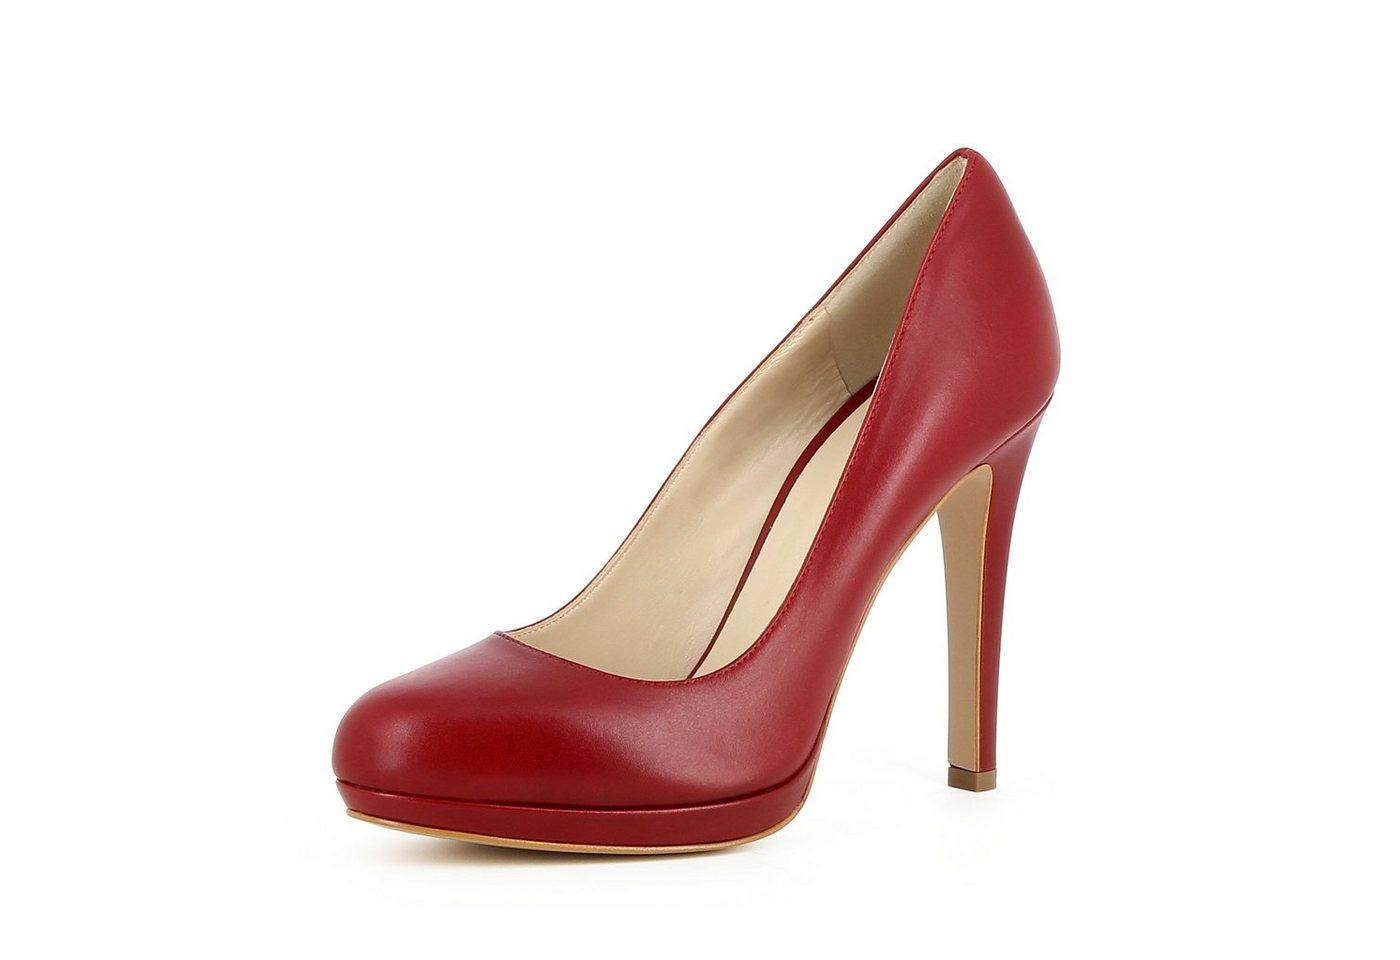 Evita »CRISTINA« Plateaupumps   Schuhe > Pumps > Plateaupumps   Rot   Evita